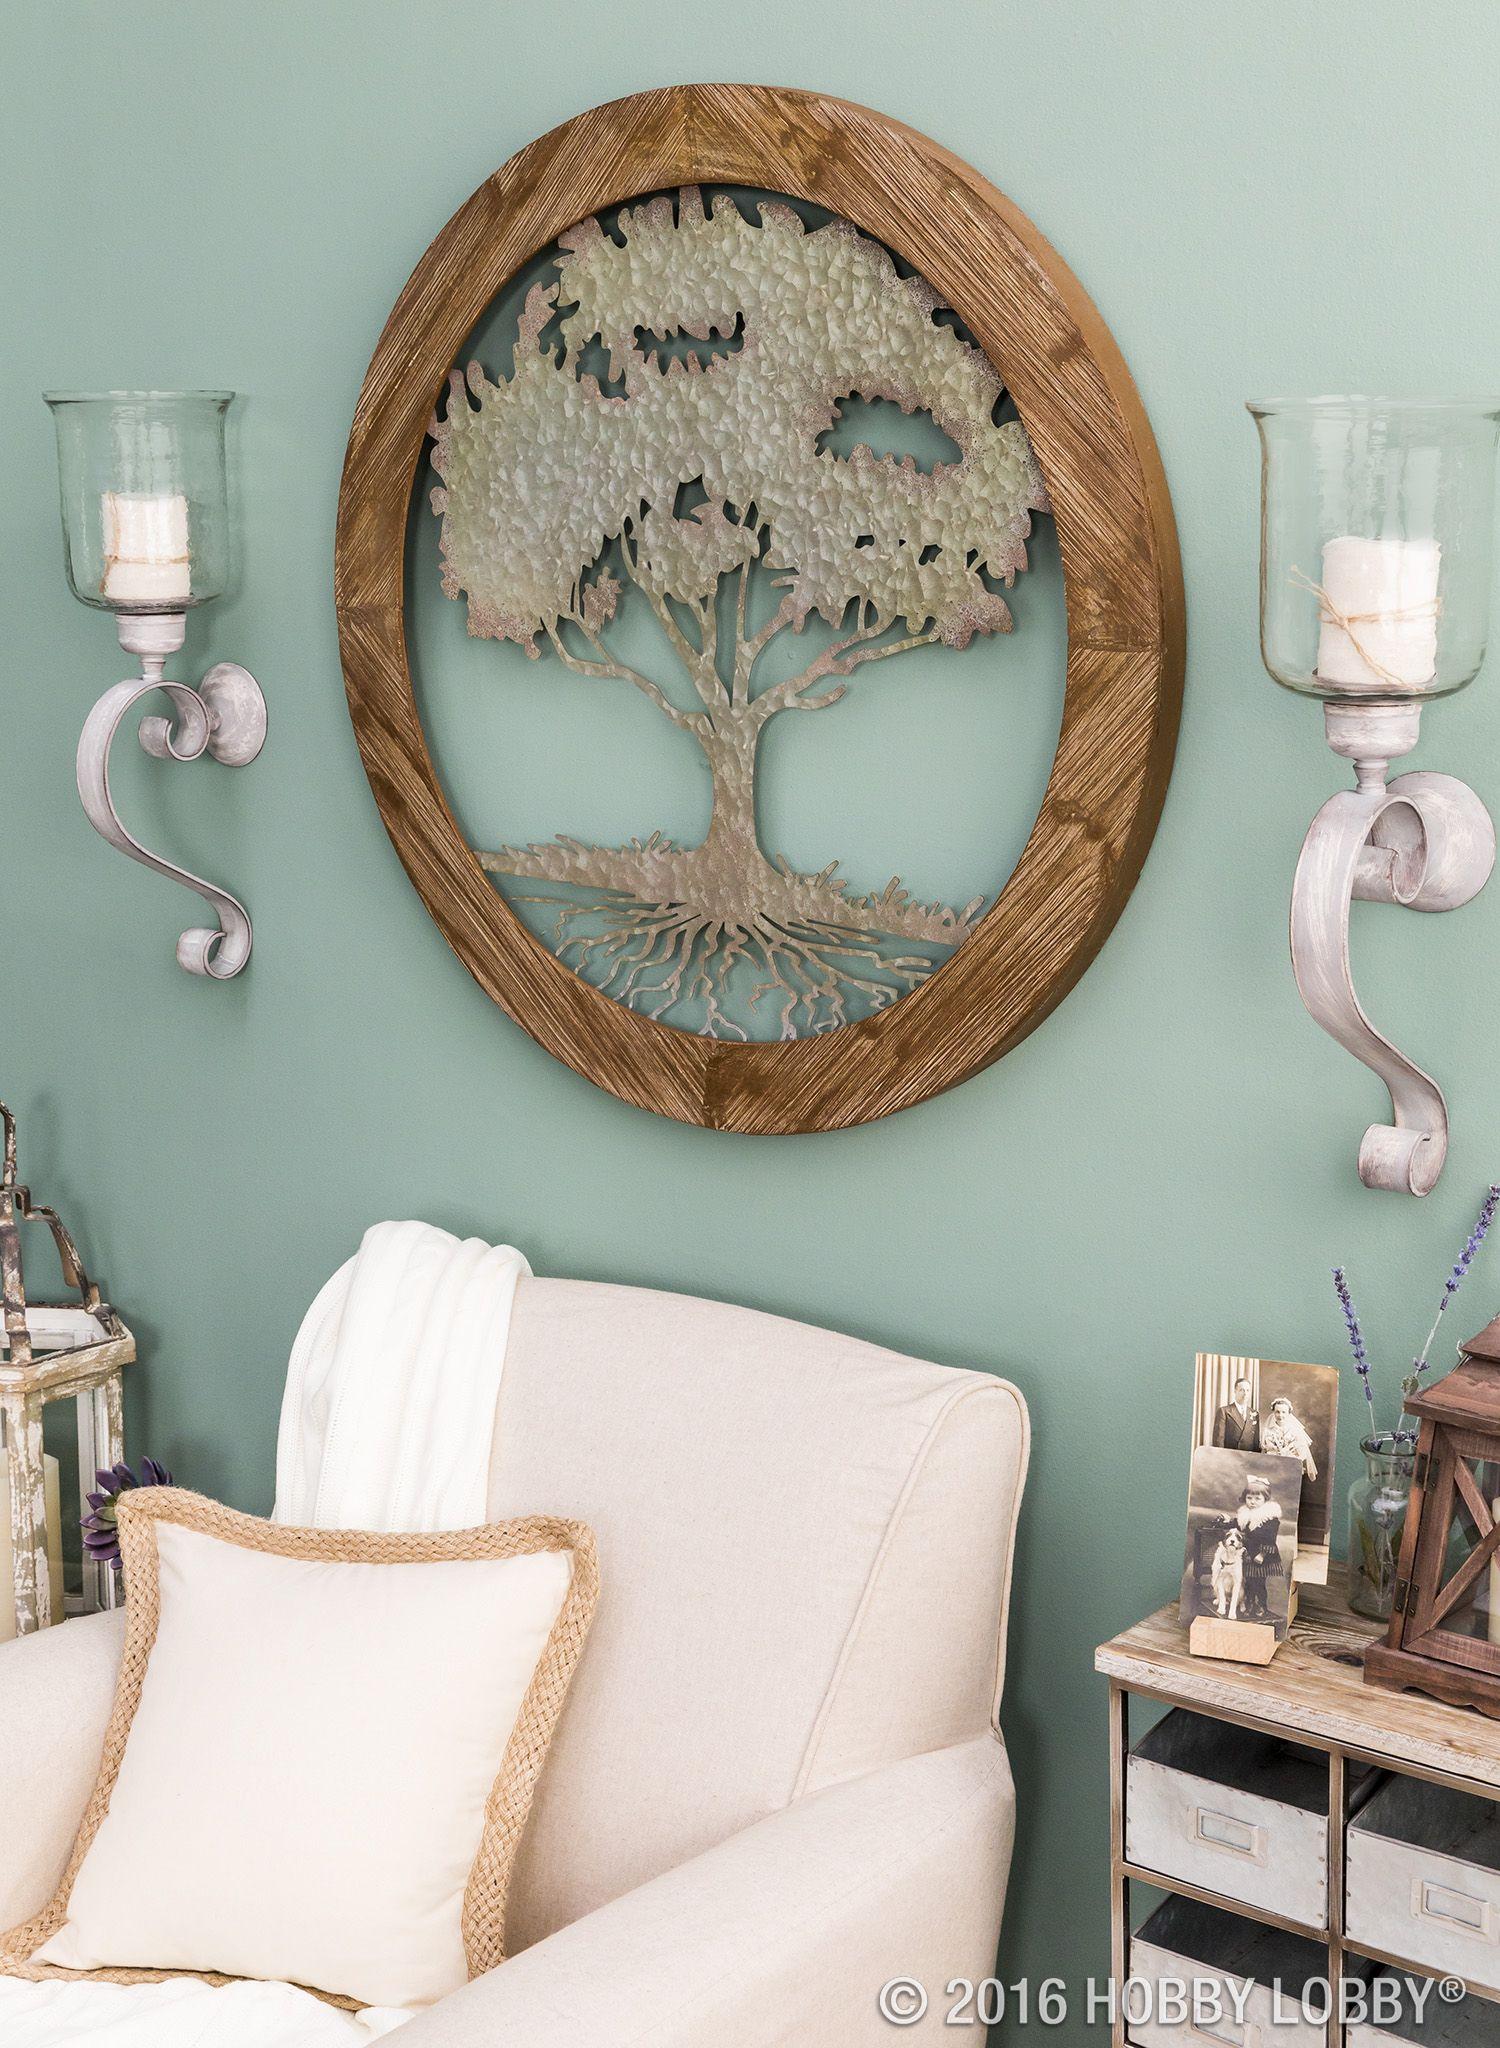 Round Tree Metal Wall Decor | Walls, Lobbies and Wall decor